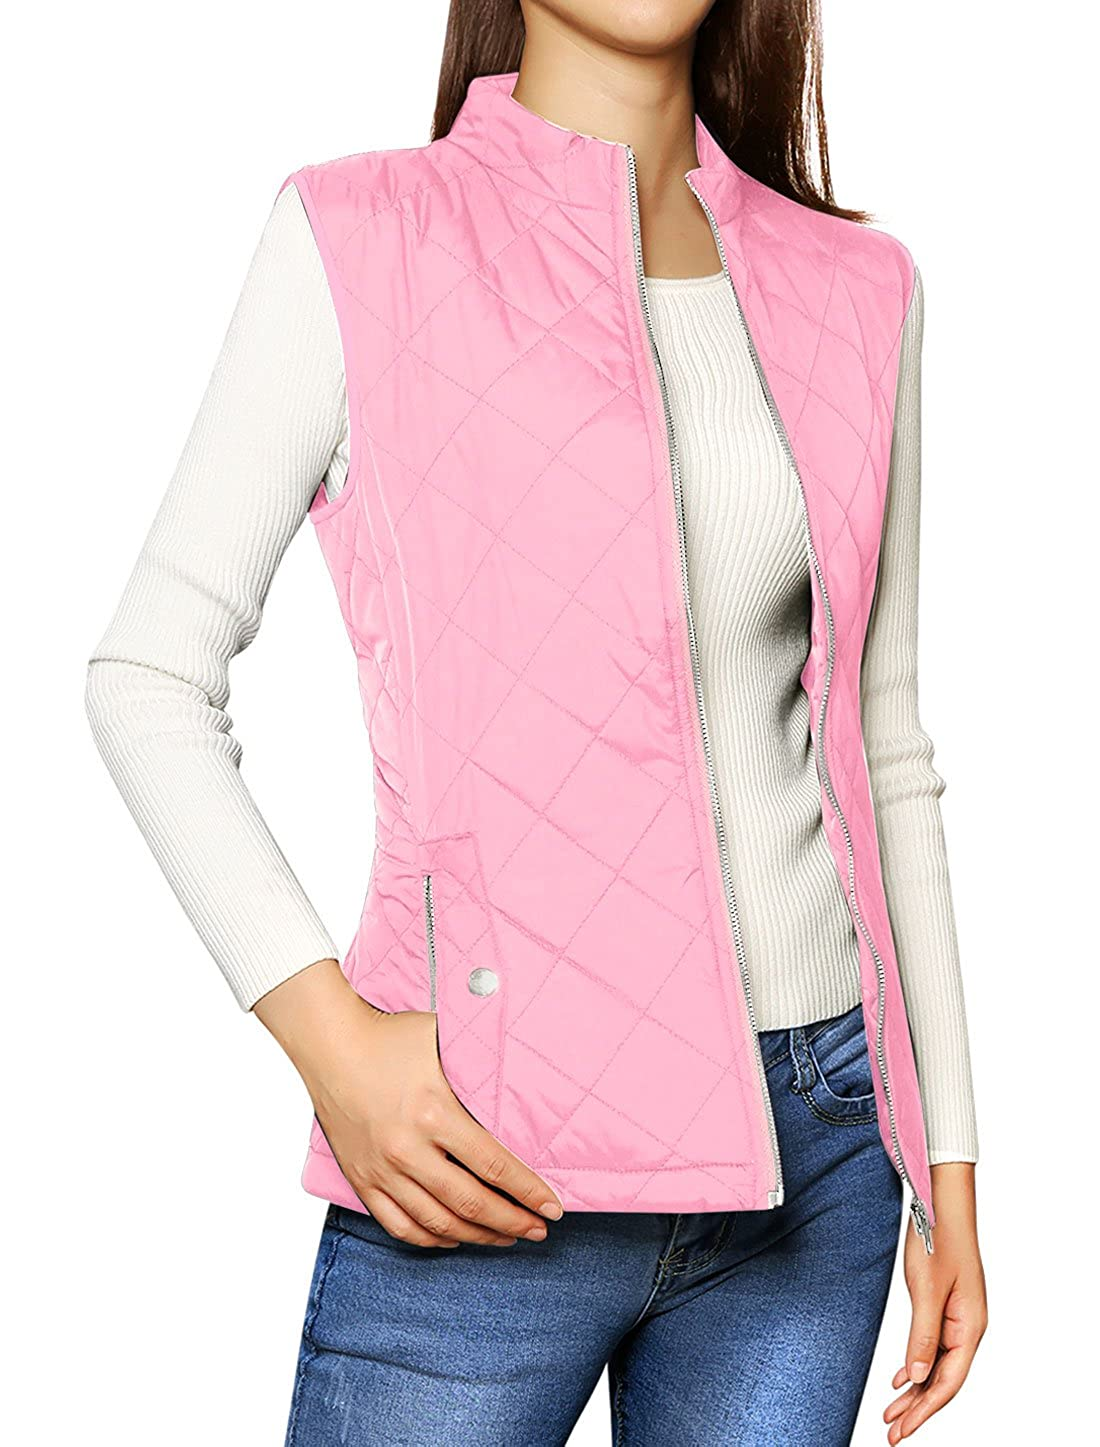 Allegra K Womens Stand Collar Lightweight Gilet Quilted Zip Vest